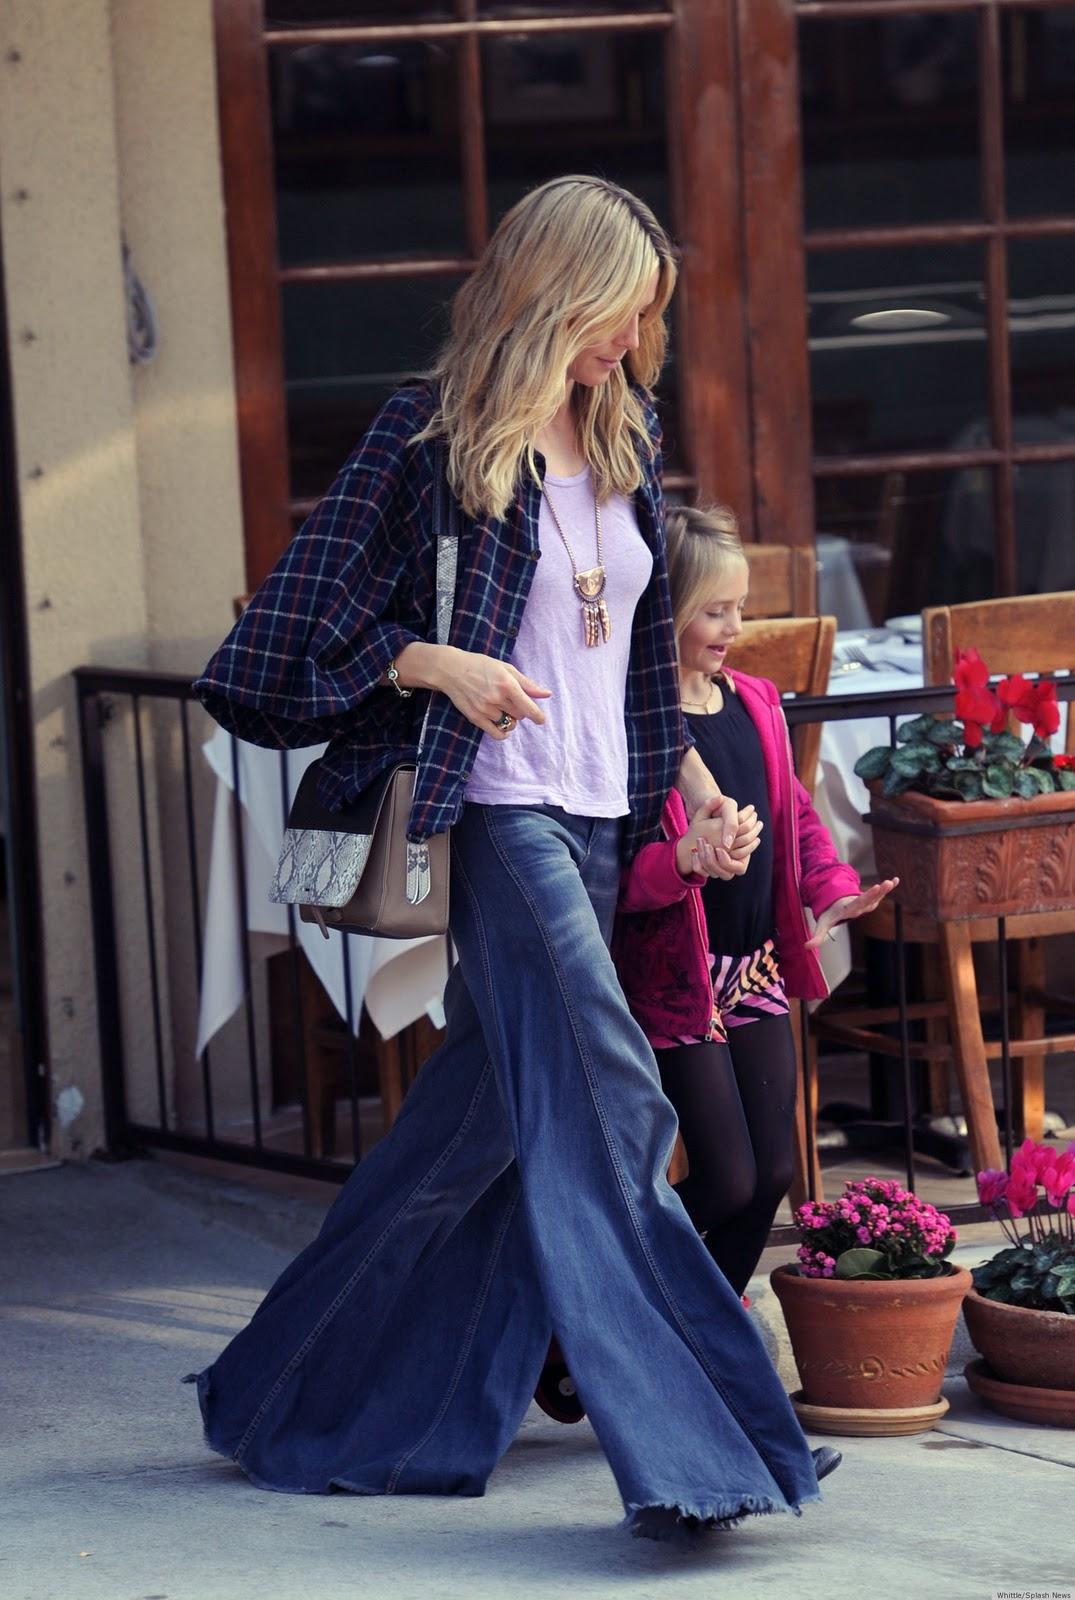 http://3.bp.blogspot.com/-4pifkbO8tfE/TwyH3C01dII/AAAAAAAATlA/IZt2q5umMT8/s1600/Heidi-Klum-jeans.jpg